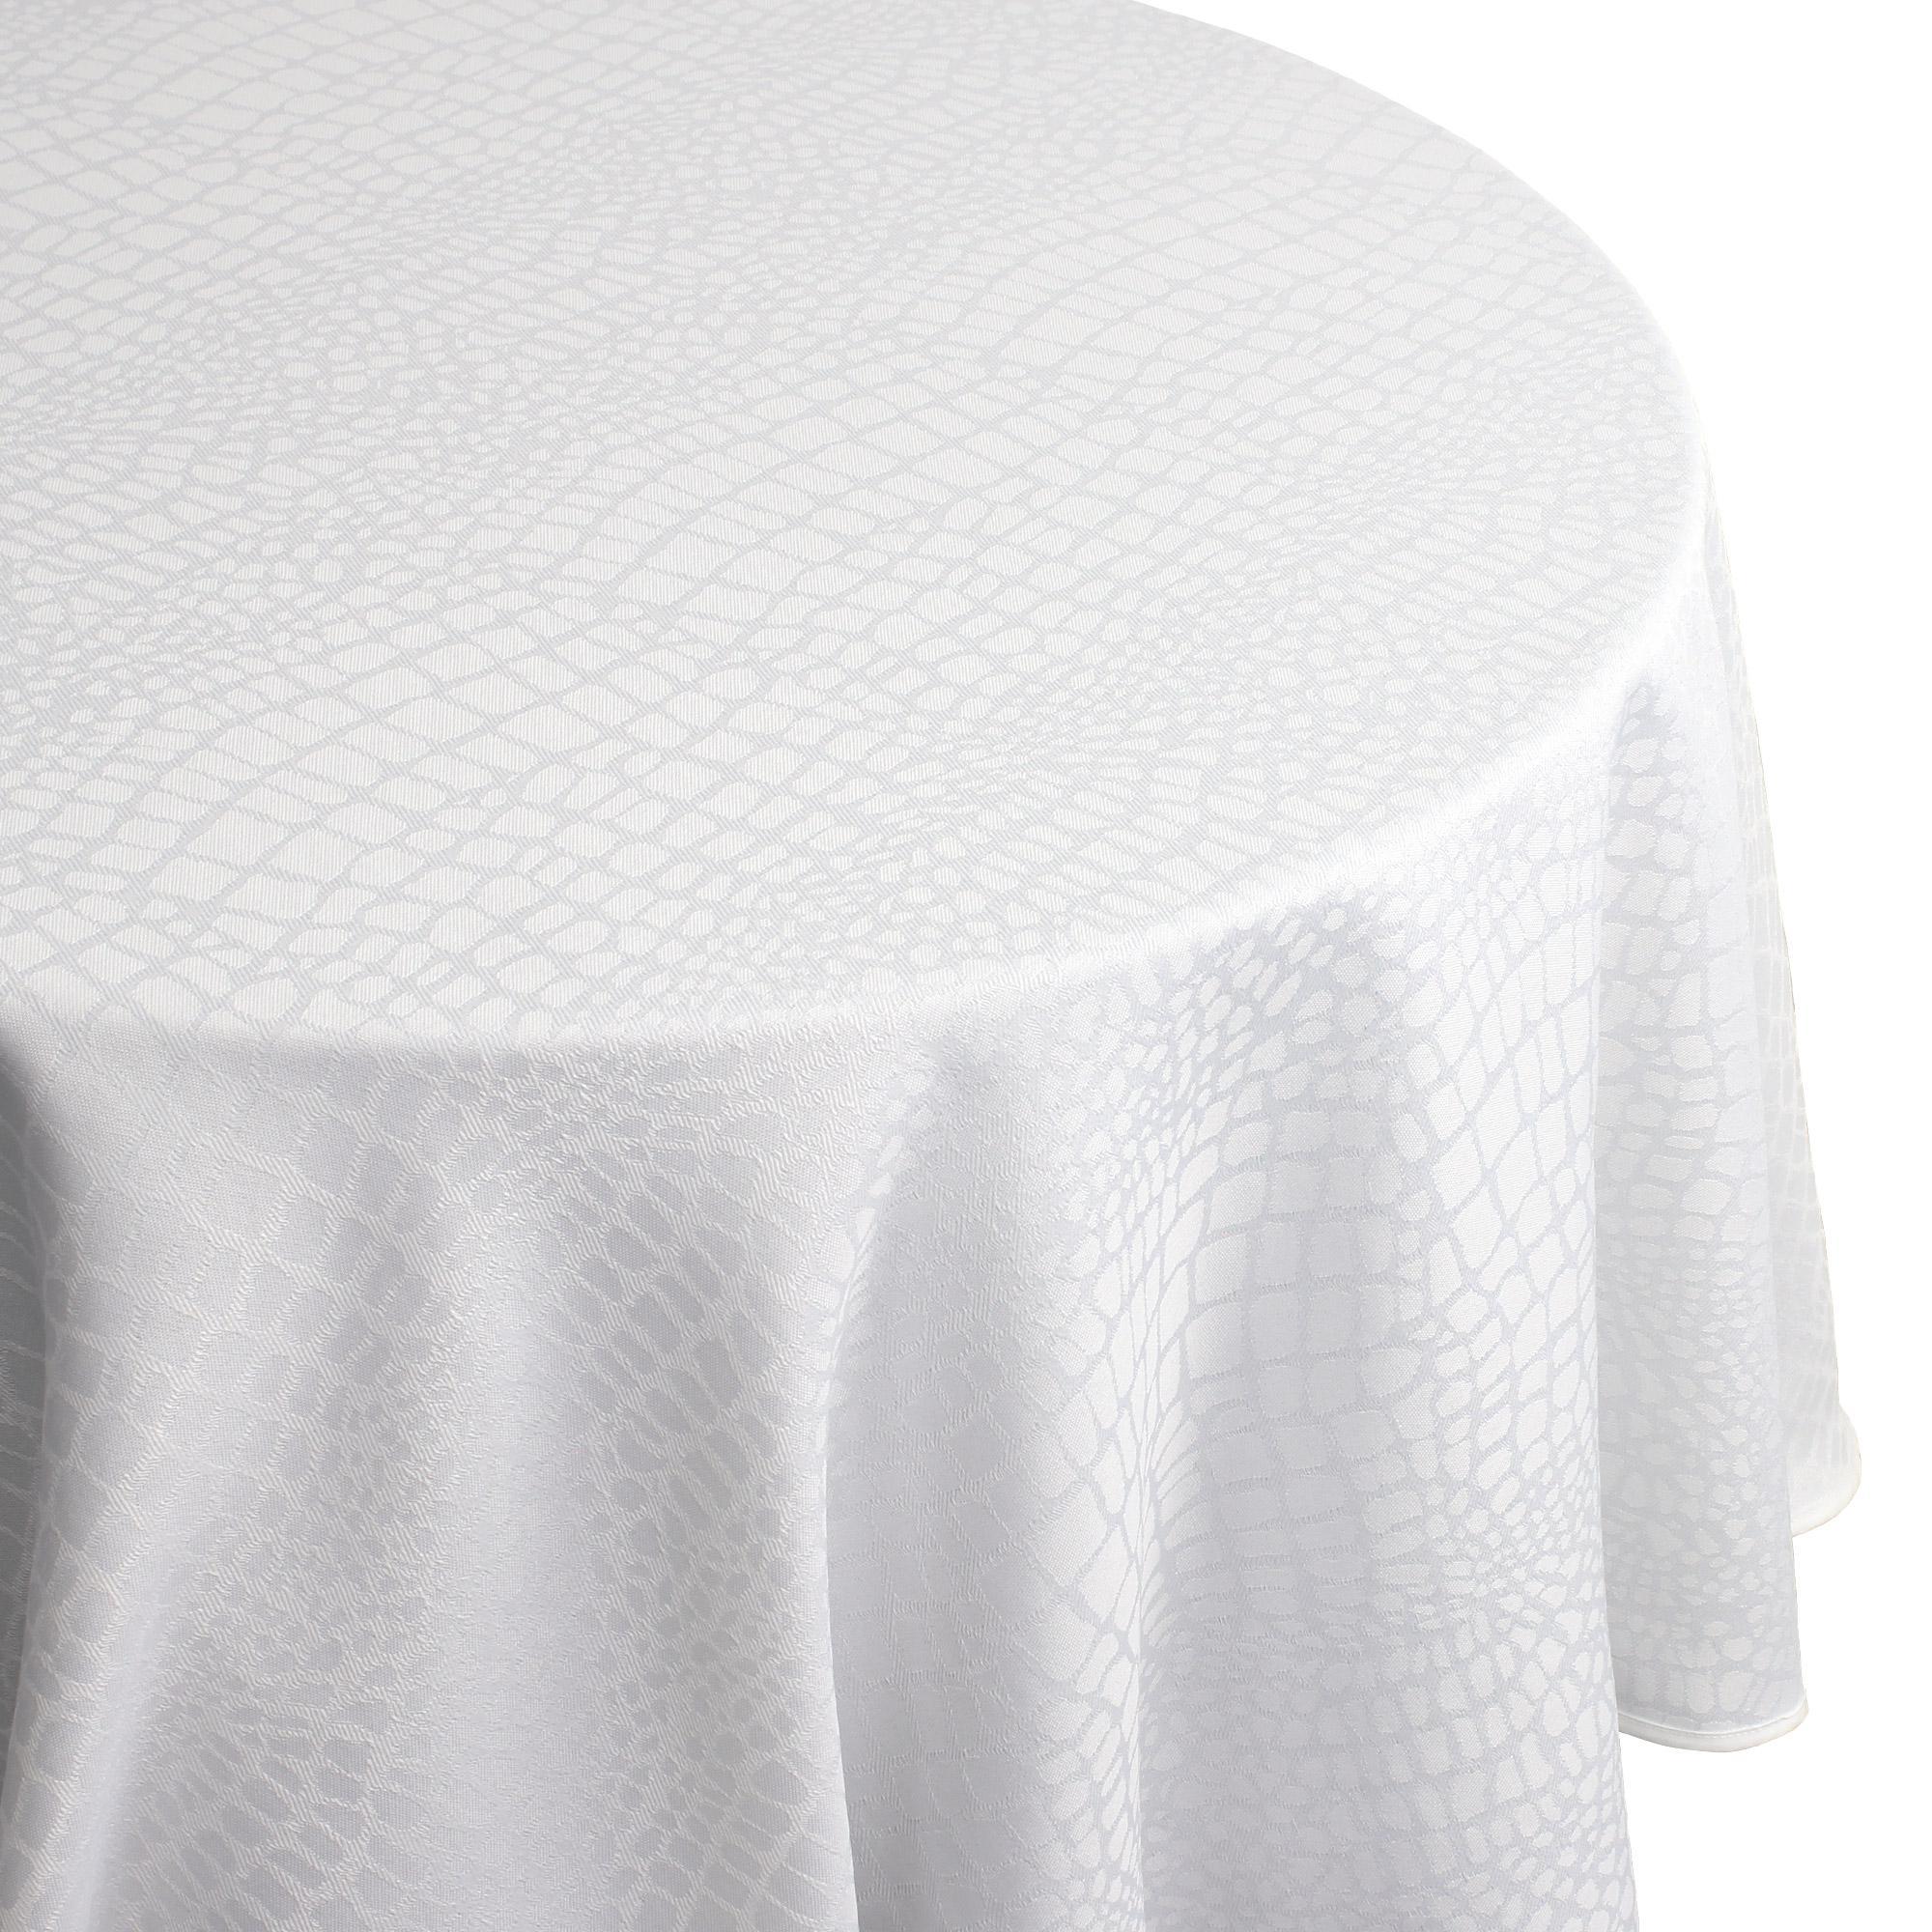 Nappe ronde 180 cm Jacquard 100% polyester LOUNGE blanc